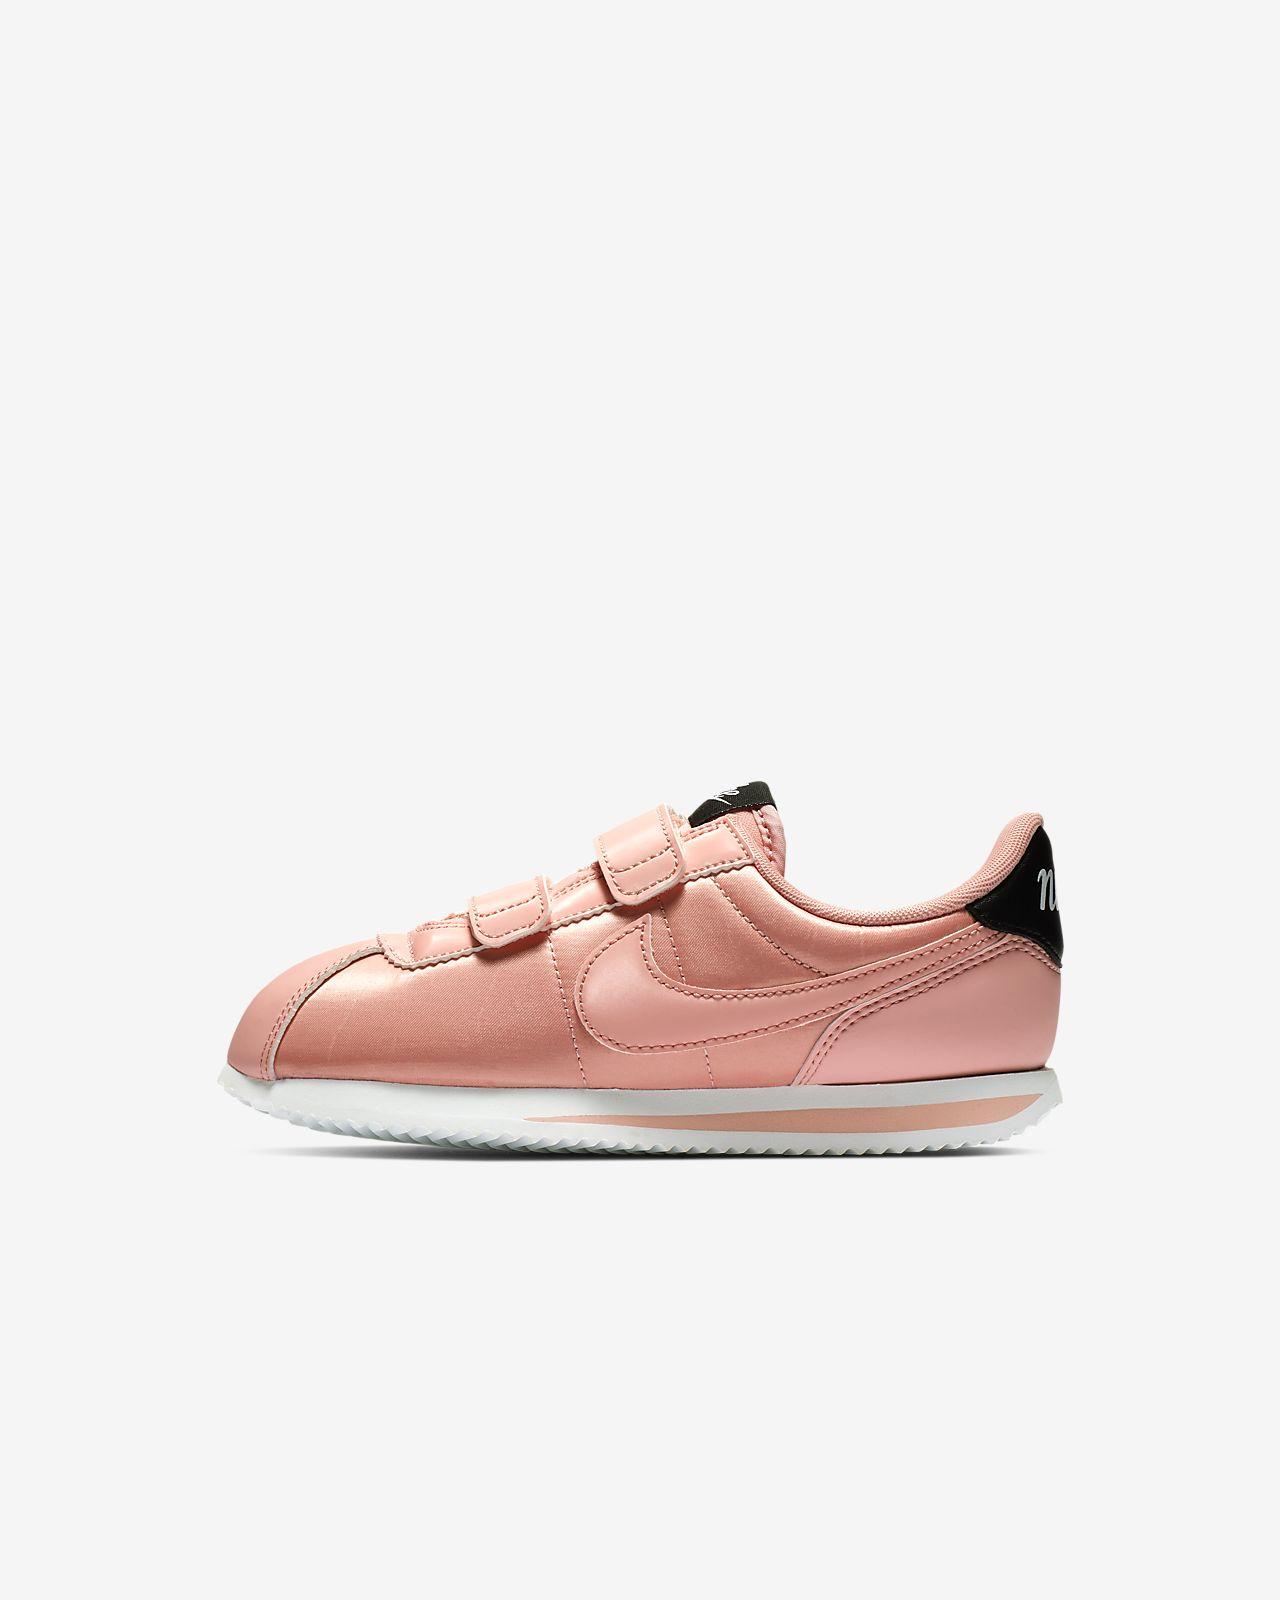 Nike Cortez Basic TXT VDAY Little Kids' Shoe